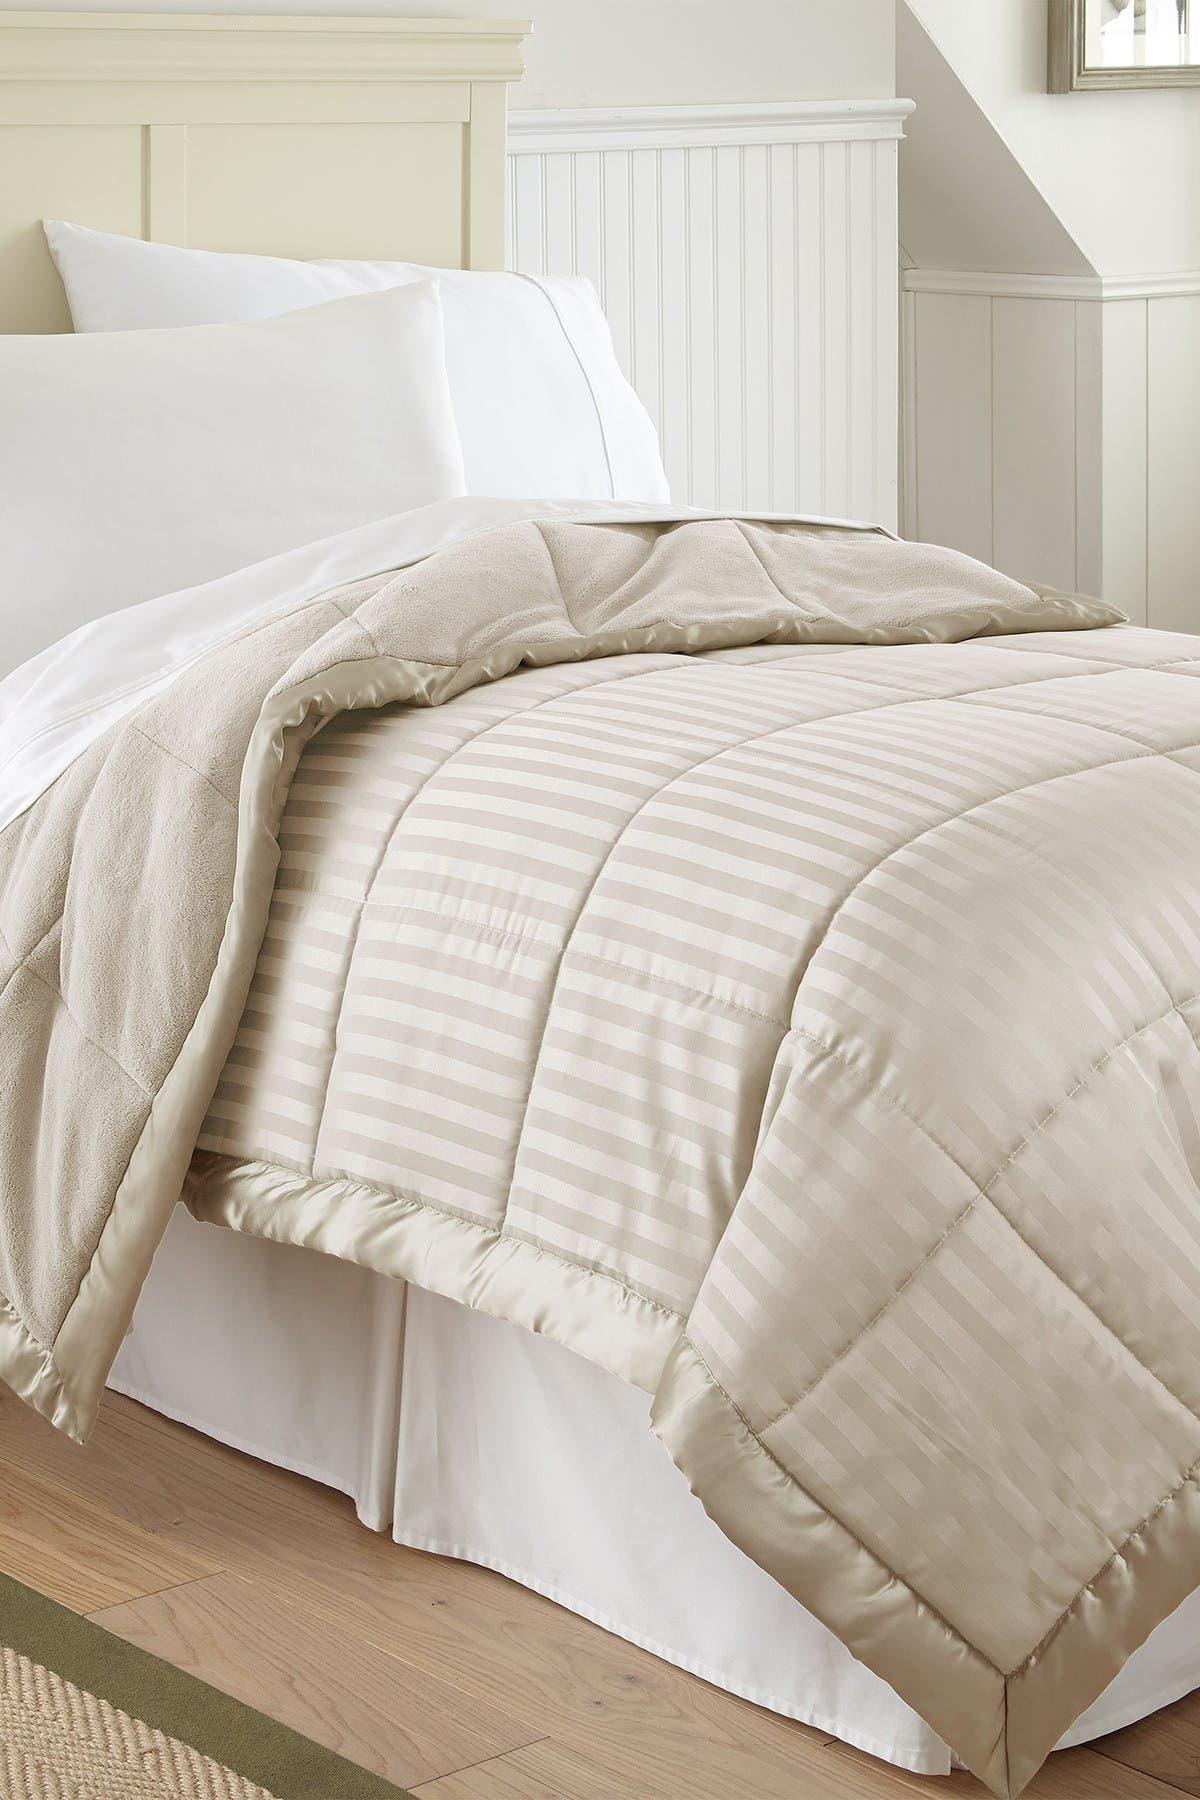 Modern Threads Full/Queen Down Alternative Blanket - Dusty Brown at Nordstrom Rack